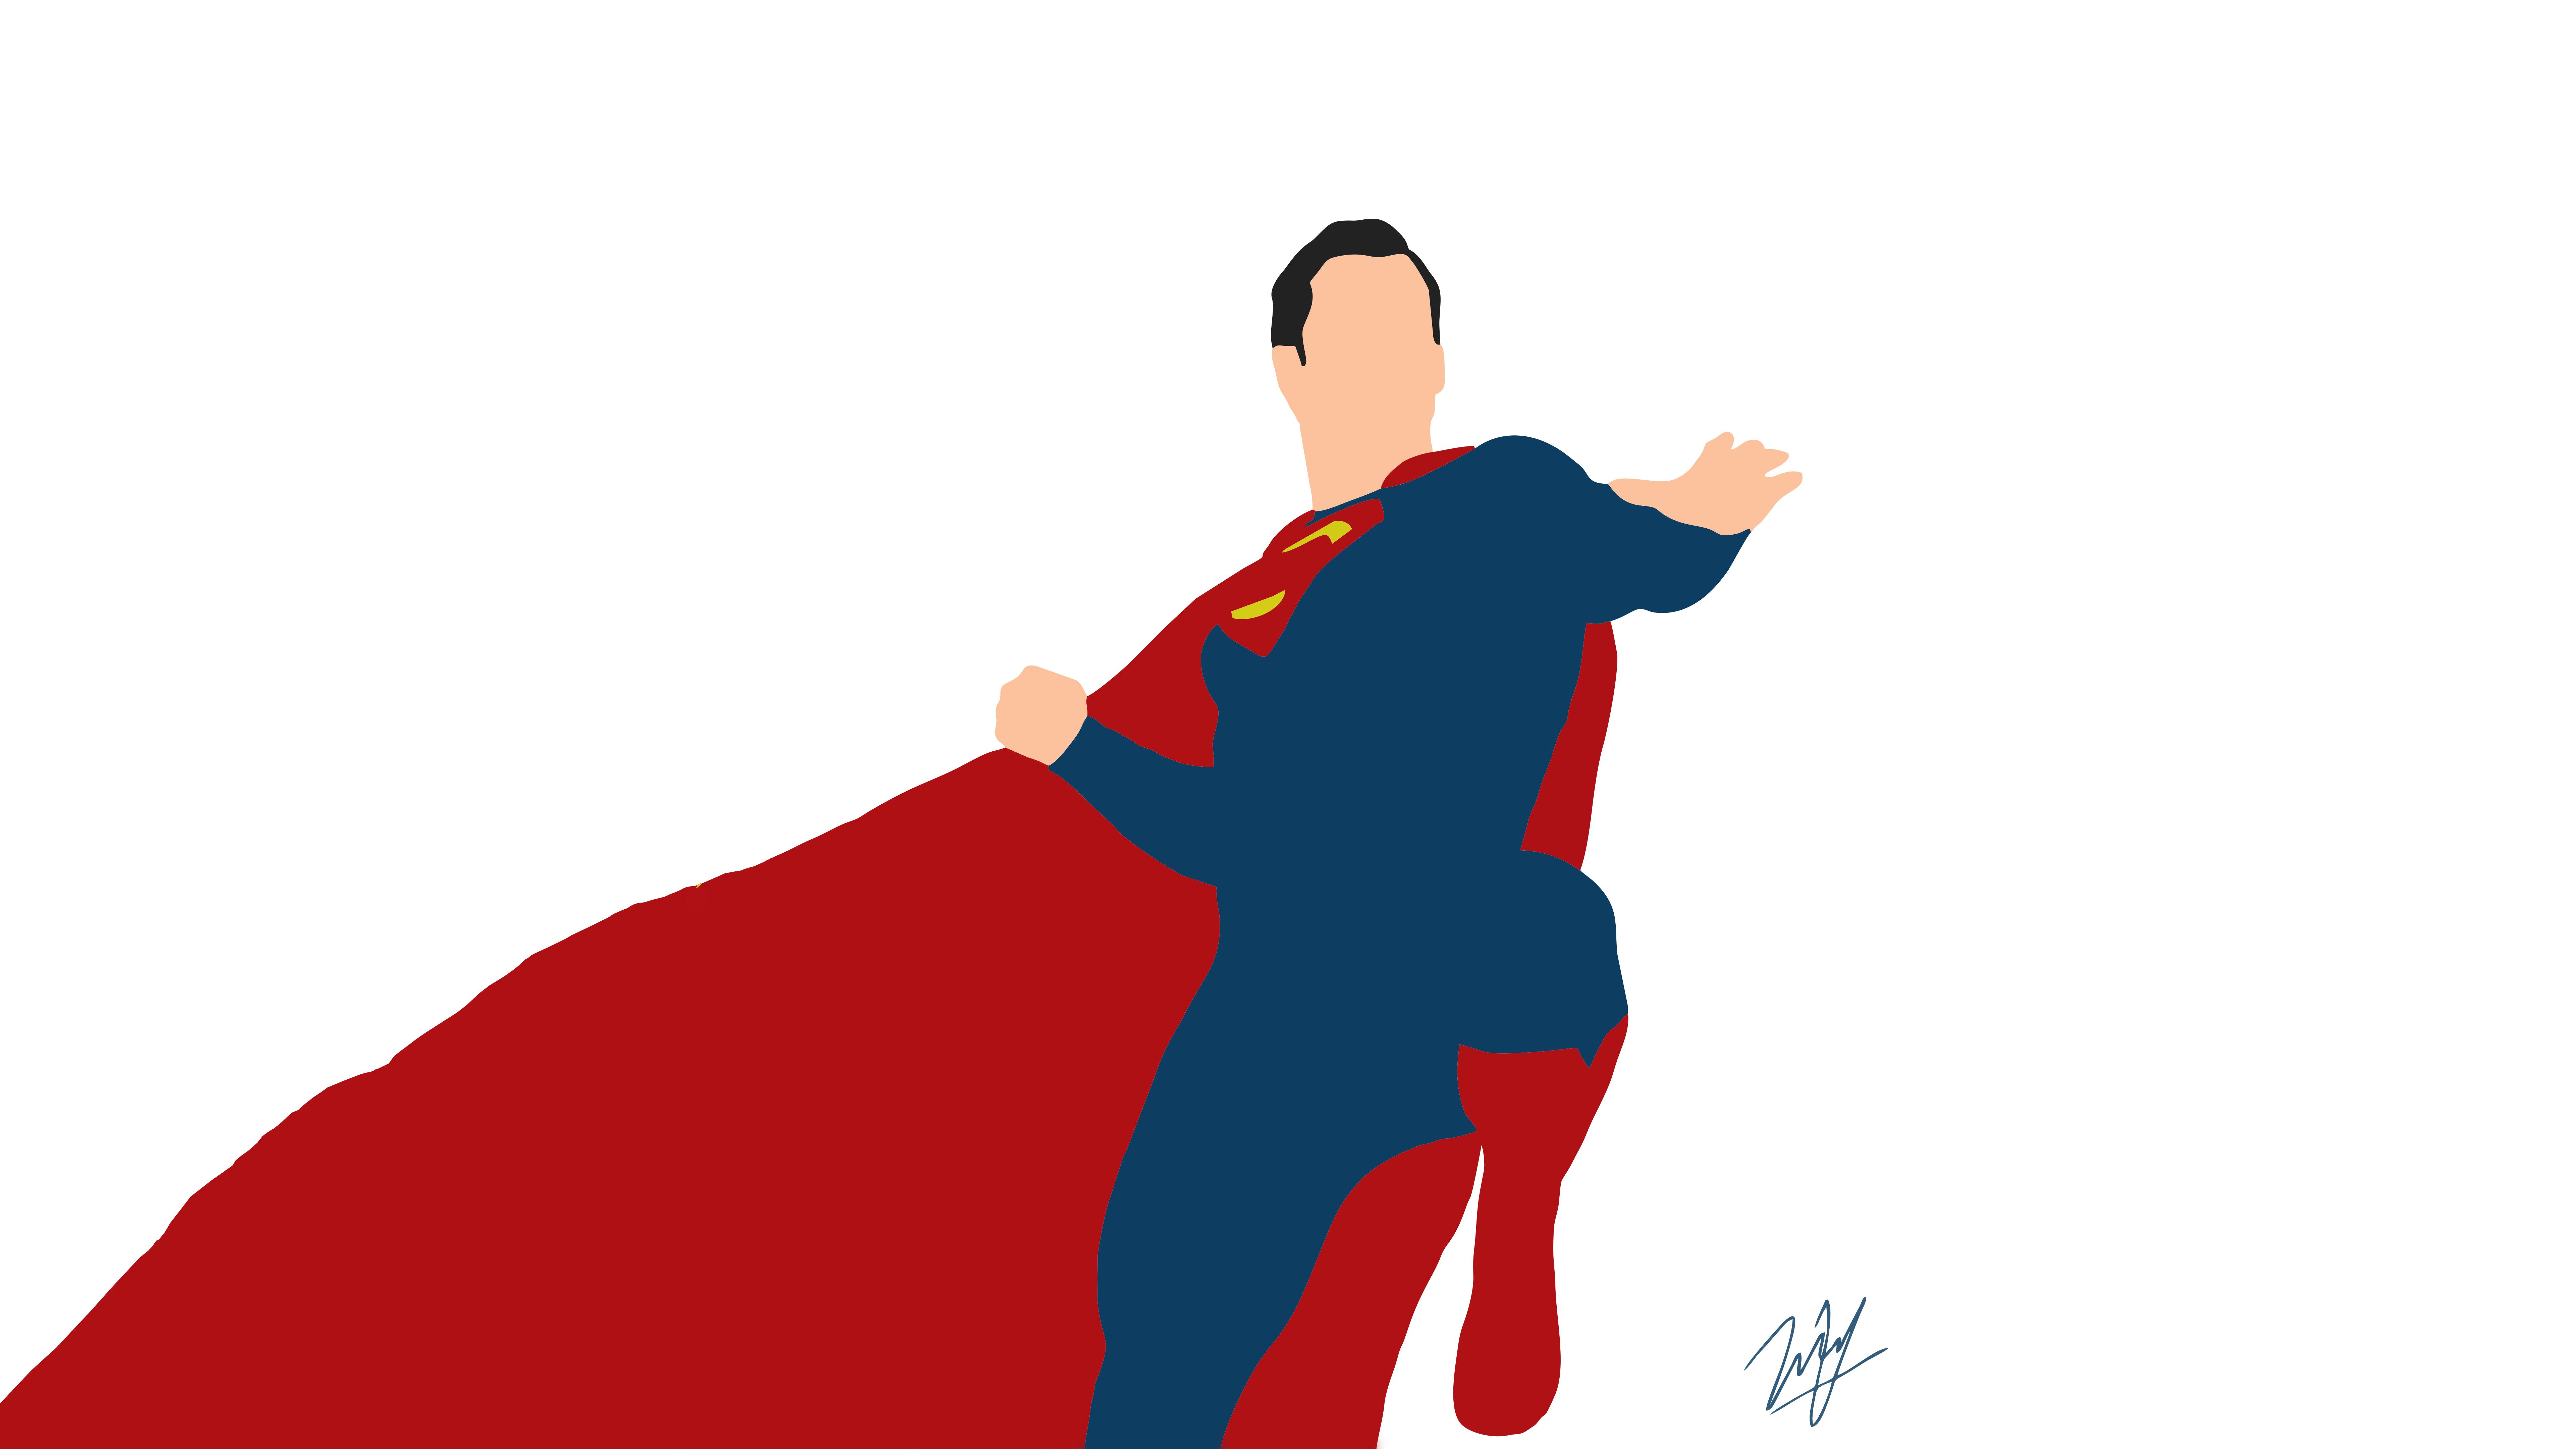 750x1334 Pubg Minimalism 4k Iphone 6 Iphone 6s Iphone 7: 1080x1920 Superman Justice League Minimalism Iphone 7,6s,6